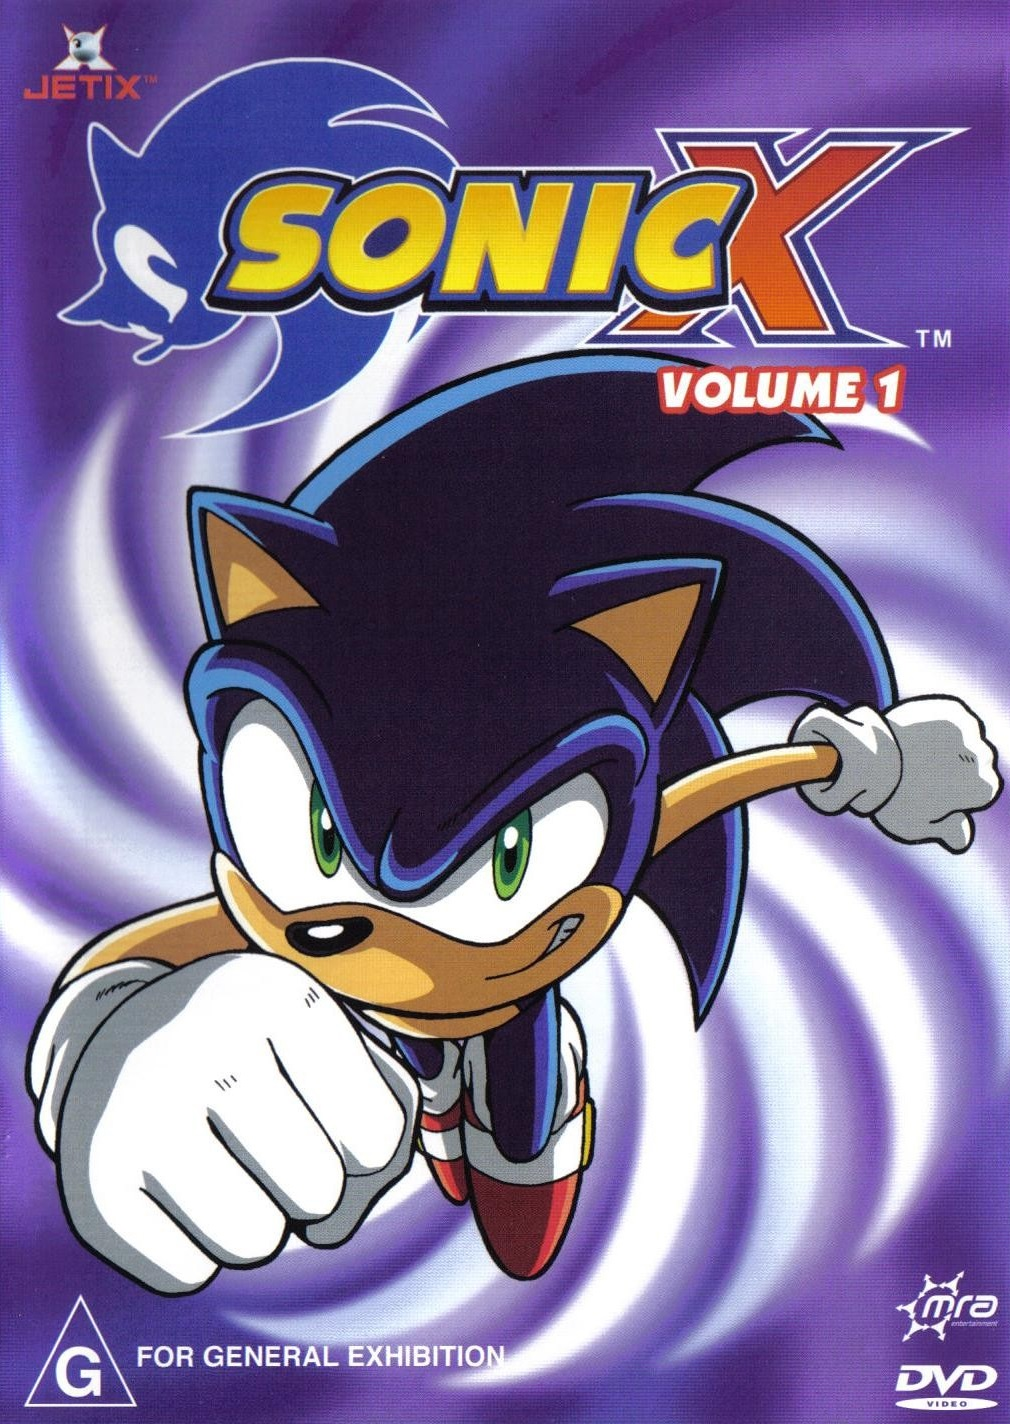 Sonic X Volume 1 Australia Sonic News Network Fandom